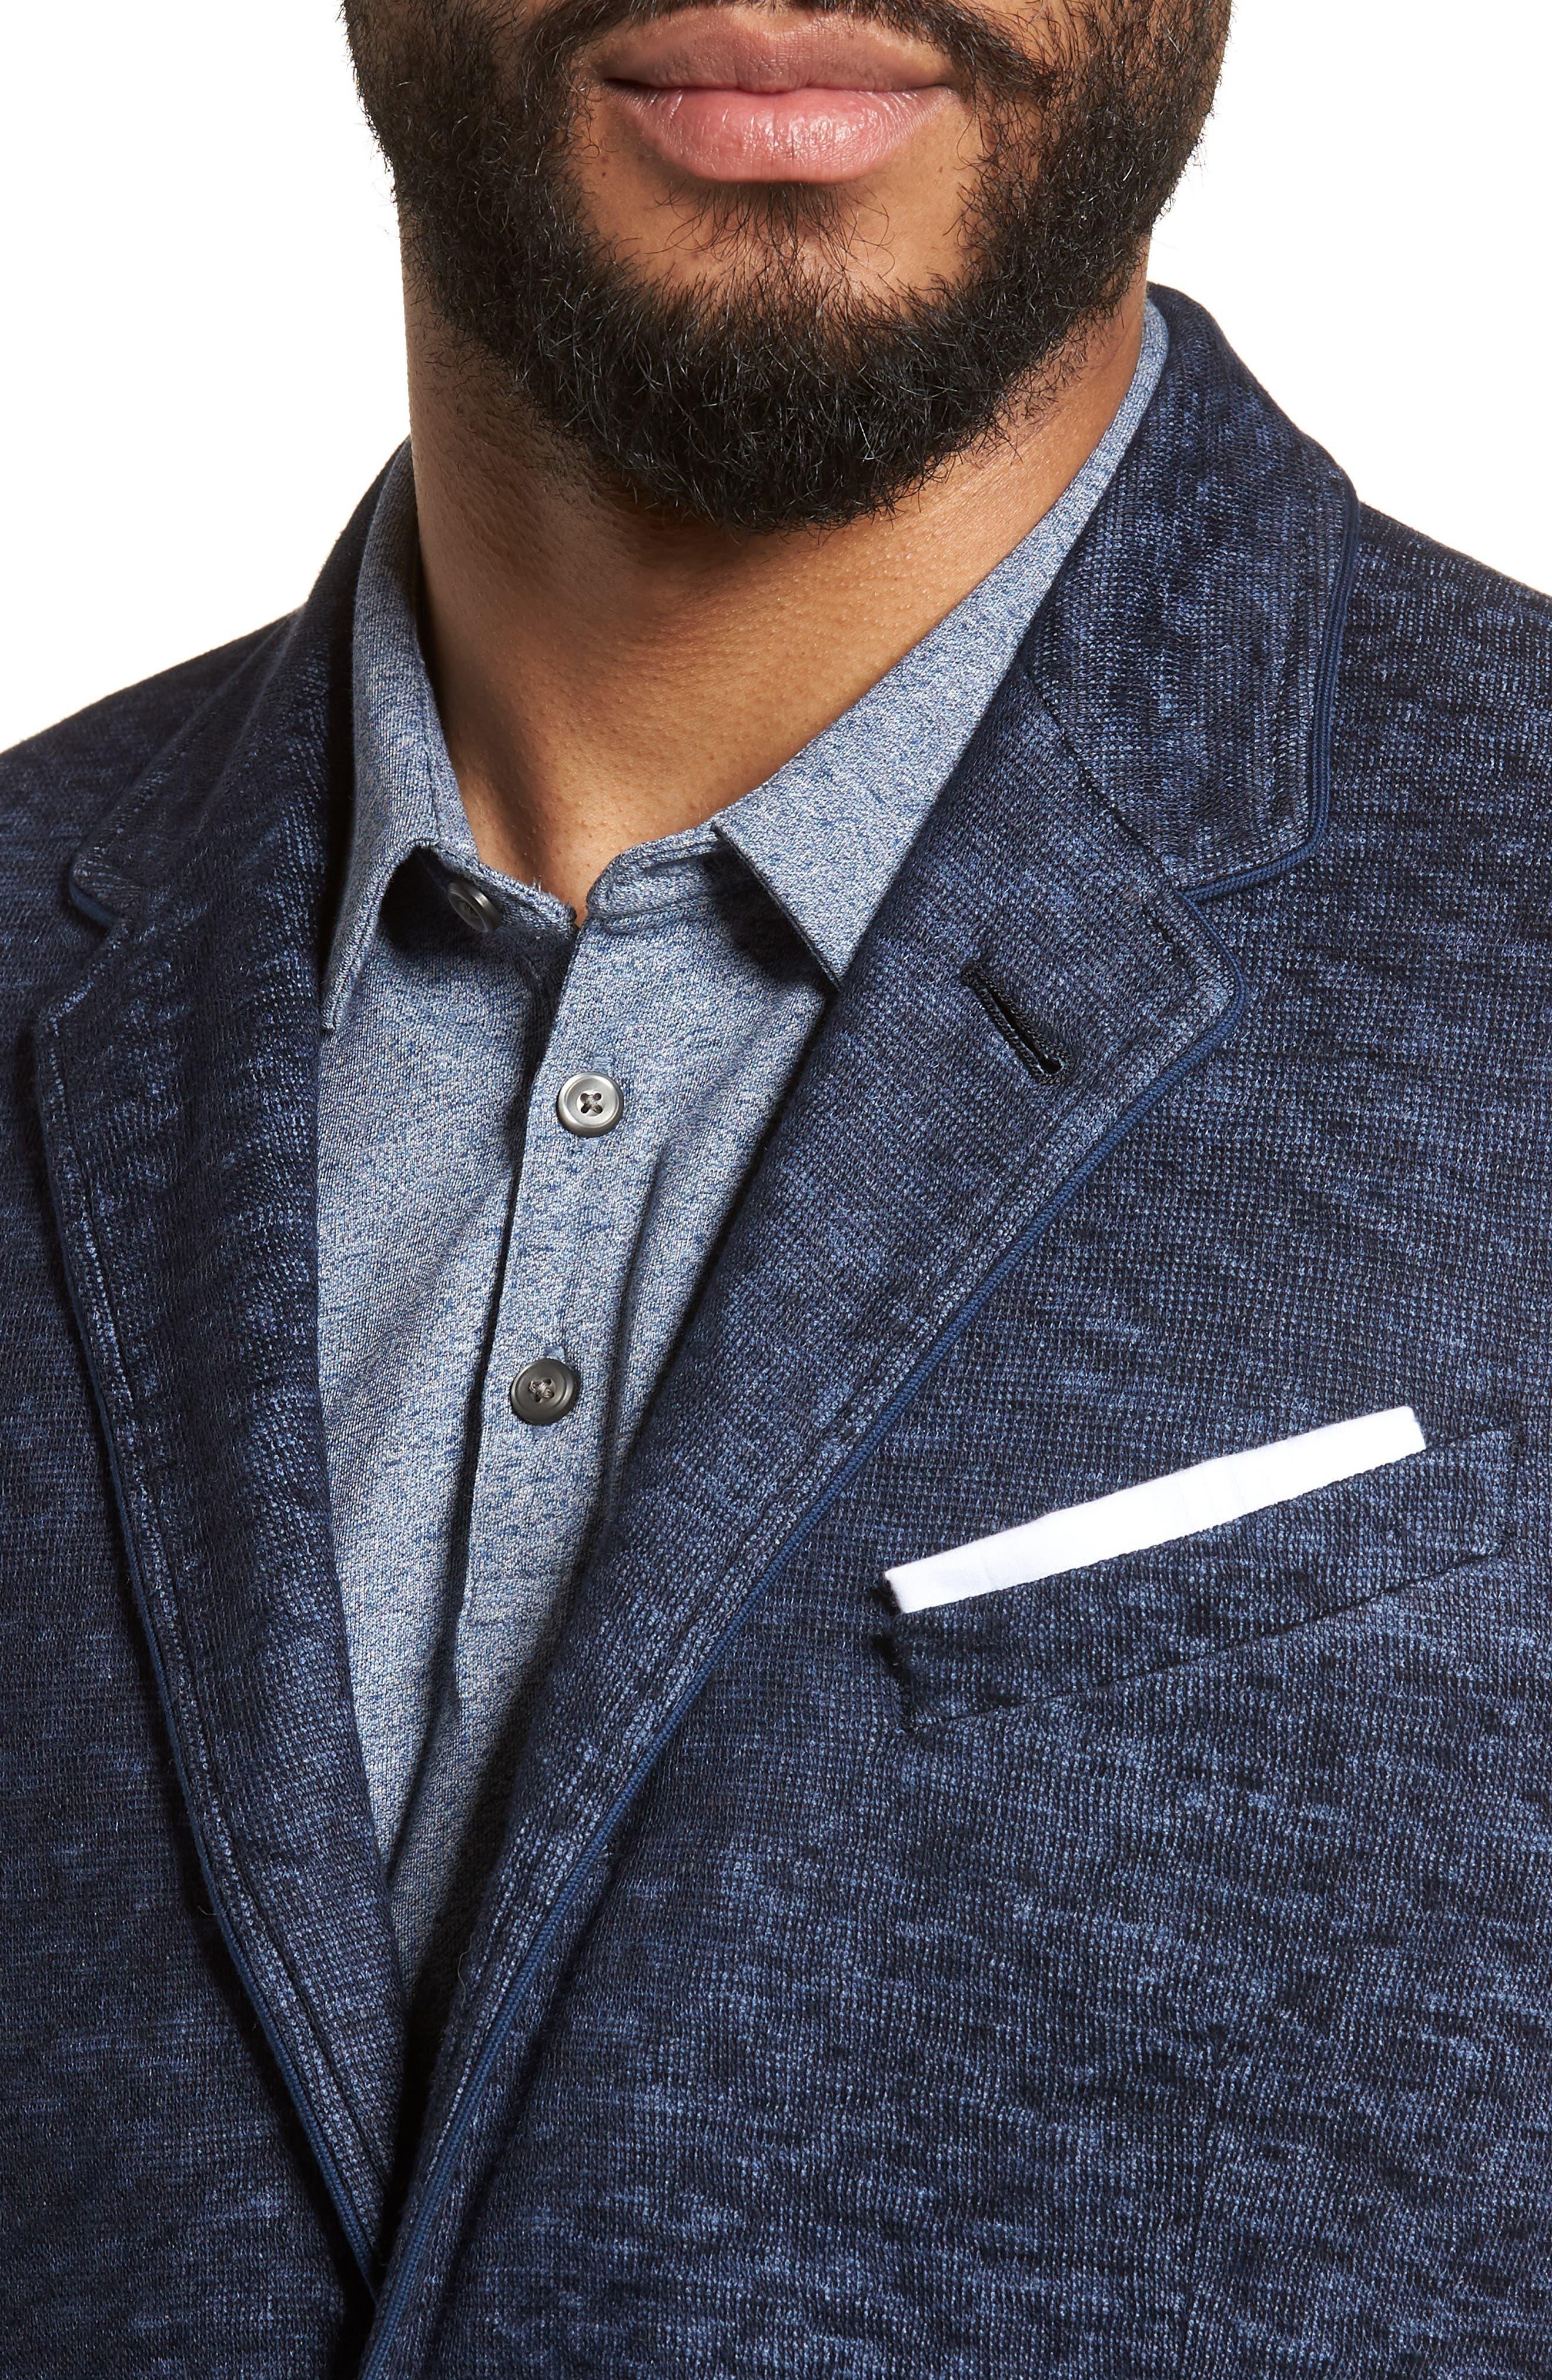 Regular Fit Cotton & Linen Blazer,                             Alternate thumbnail 4, color,                             Officer Blue